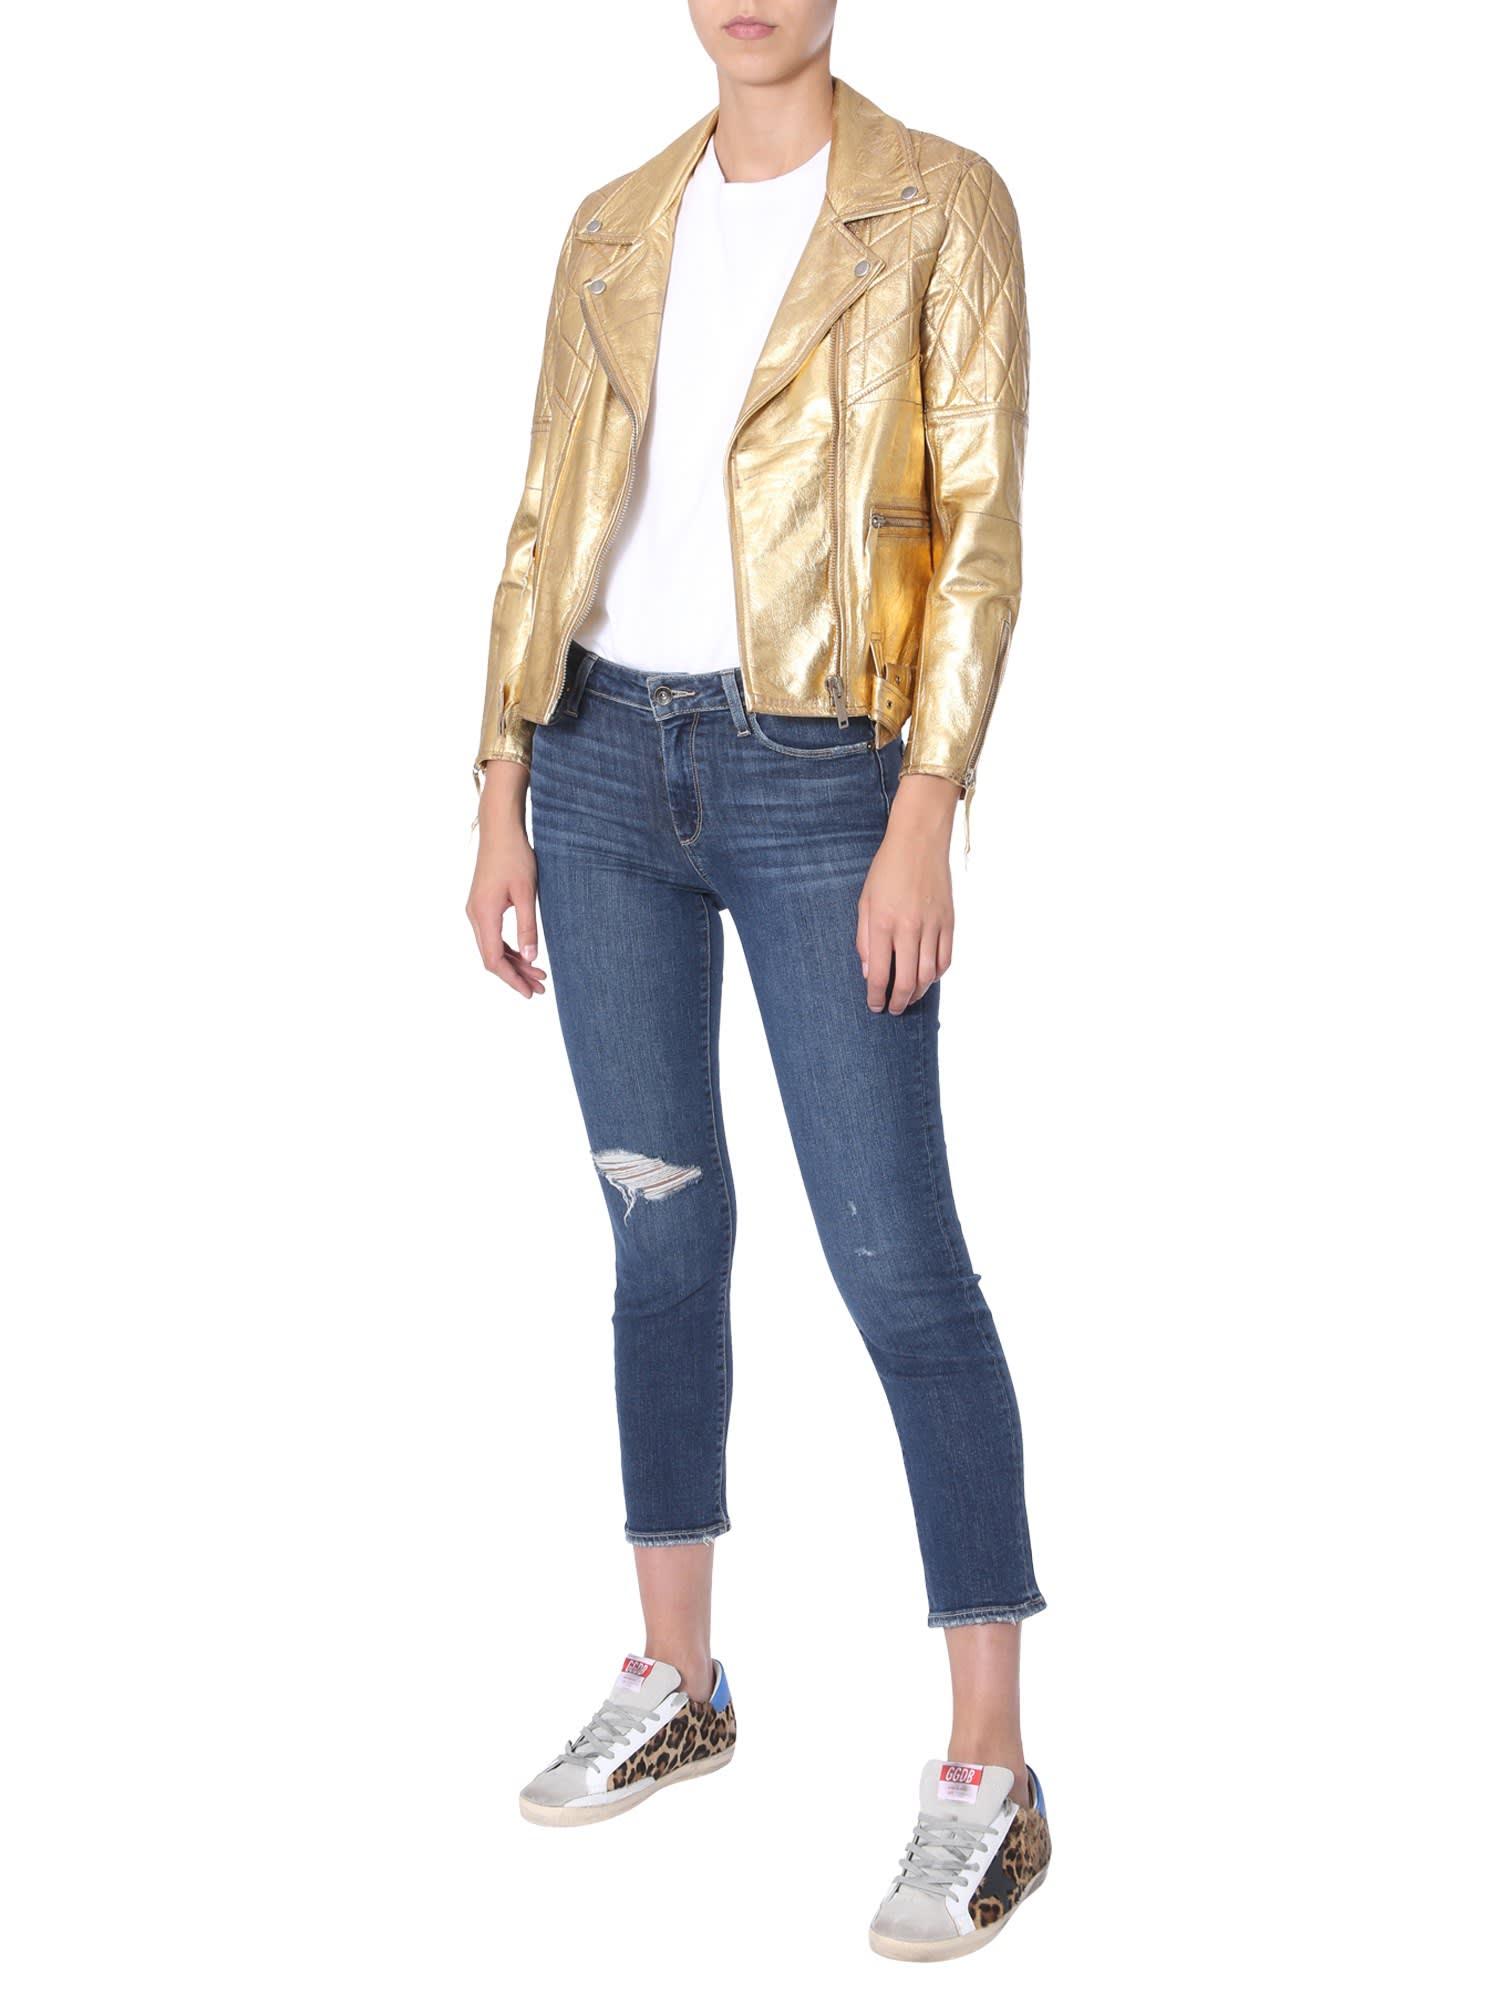 Golden Goose Yasu Jacket